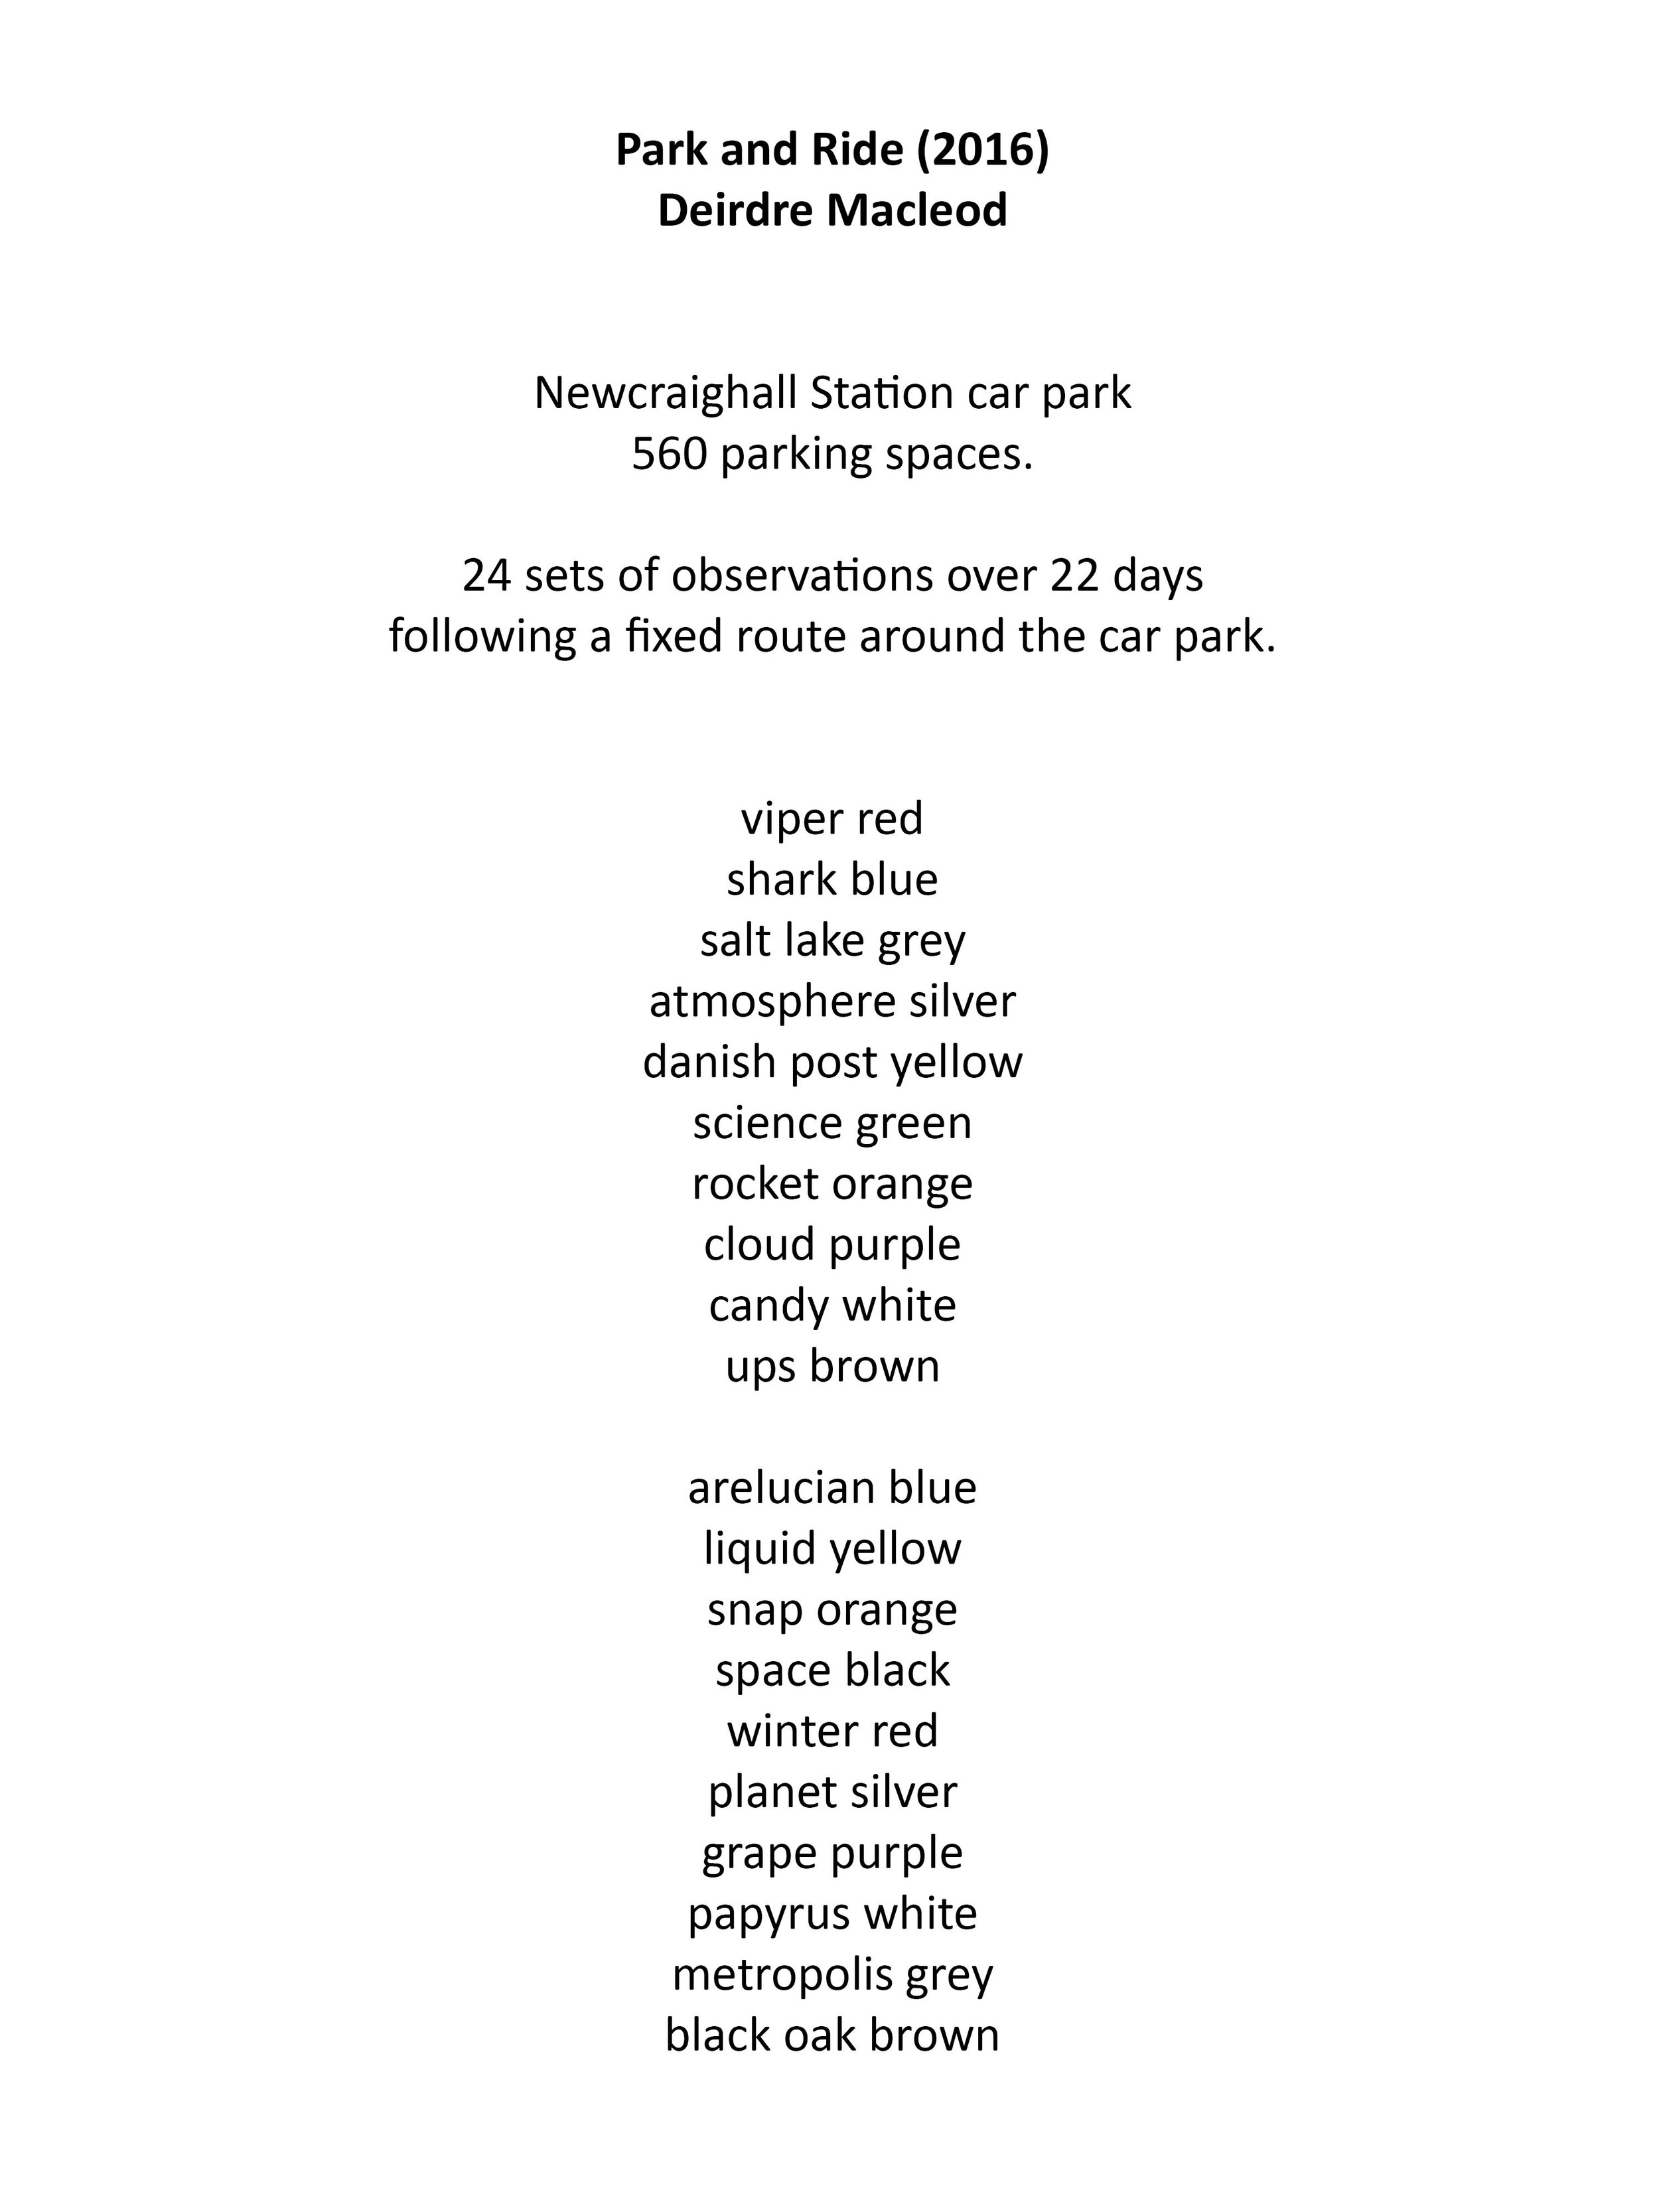 park and ride concrete poem.jpg